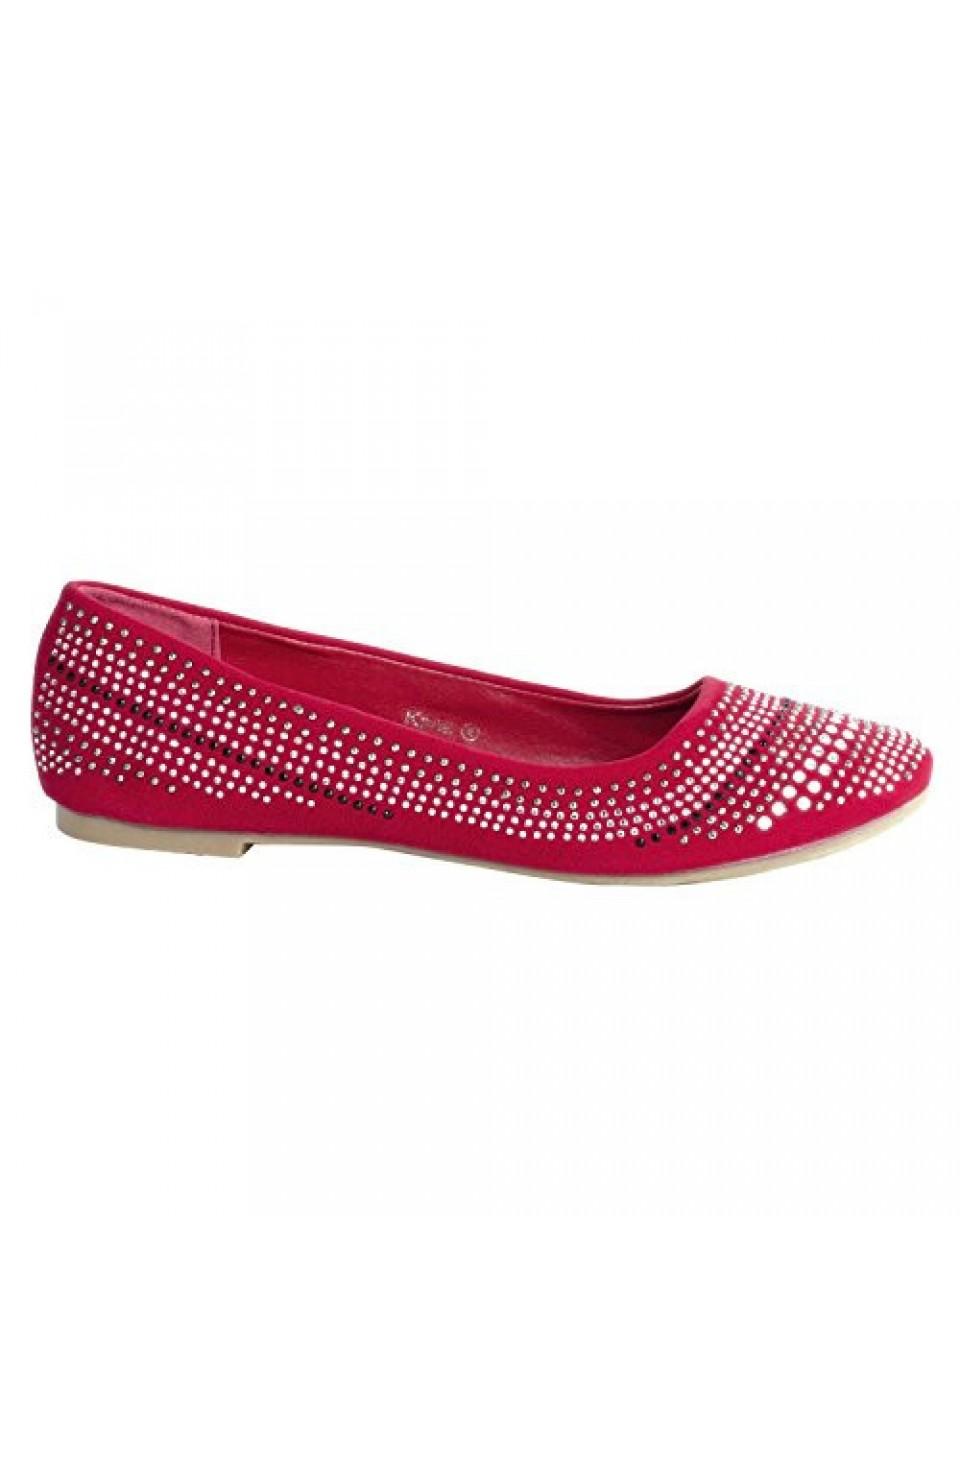 Women's Red Kana Manmade Chic Ballet Flat with Glittering Jewel Design